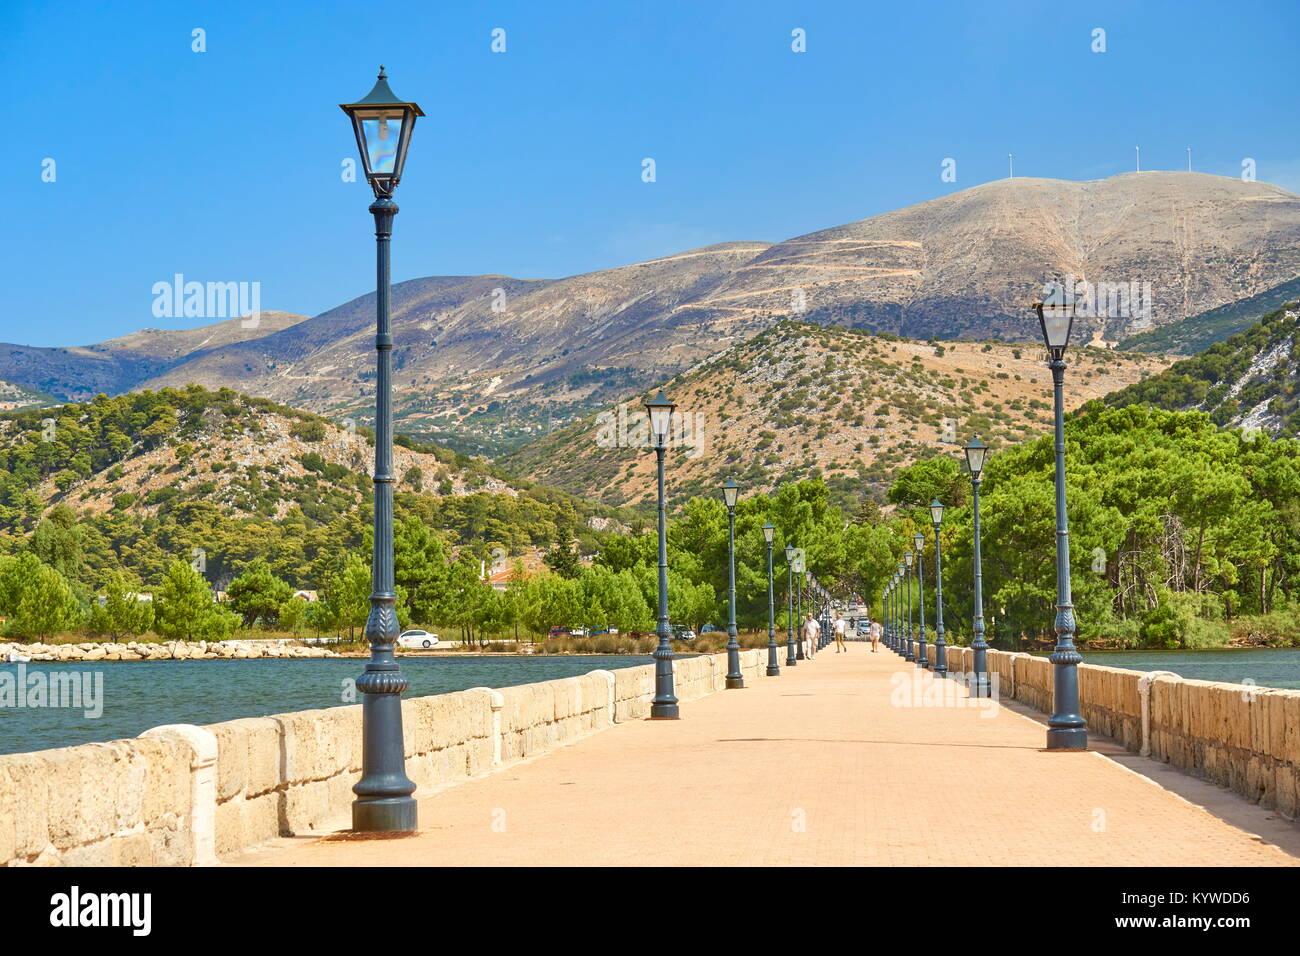 Drapanos Bridge, Agrostoli, Kefalonia Island, Greece - Stock Image